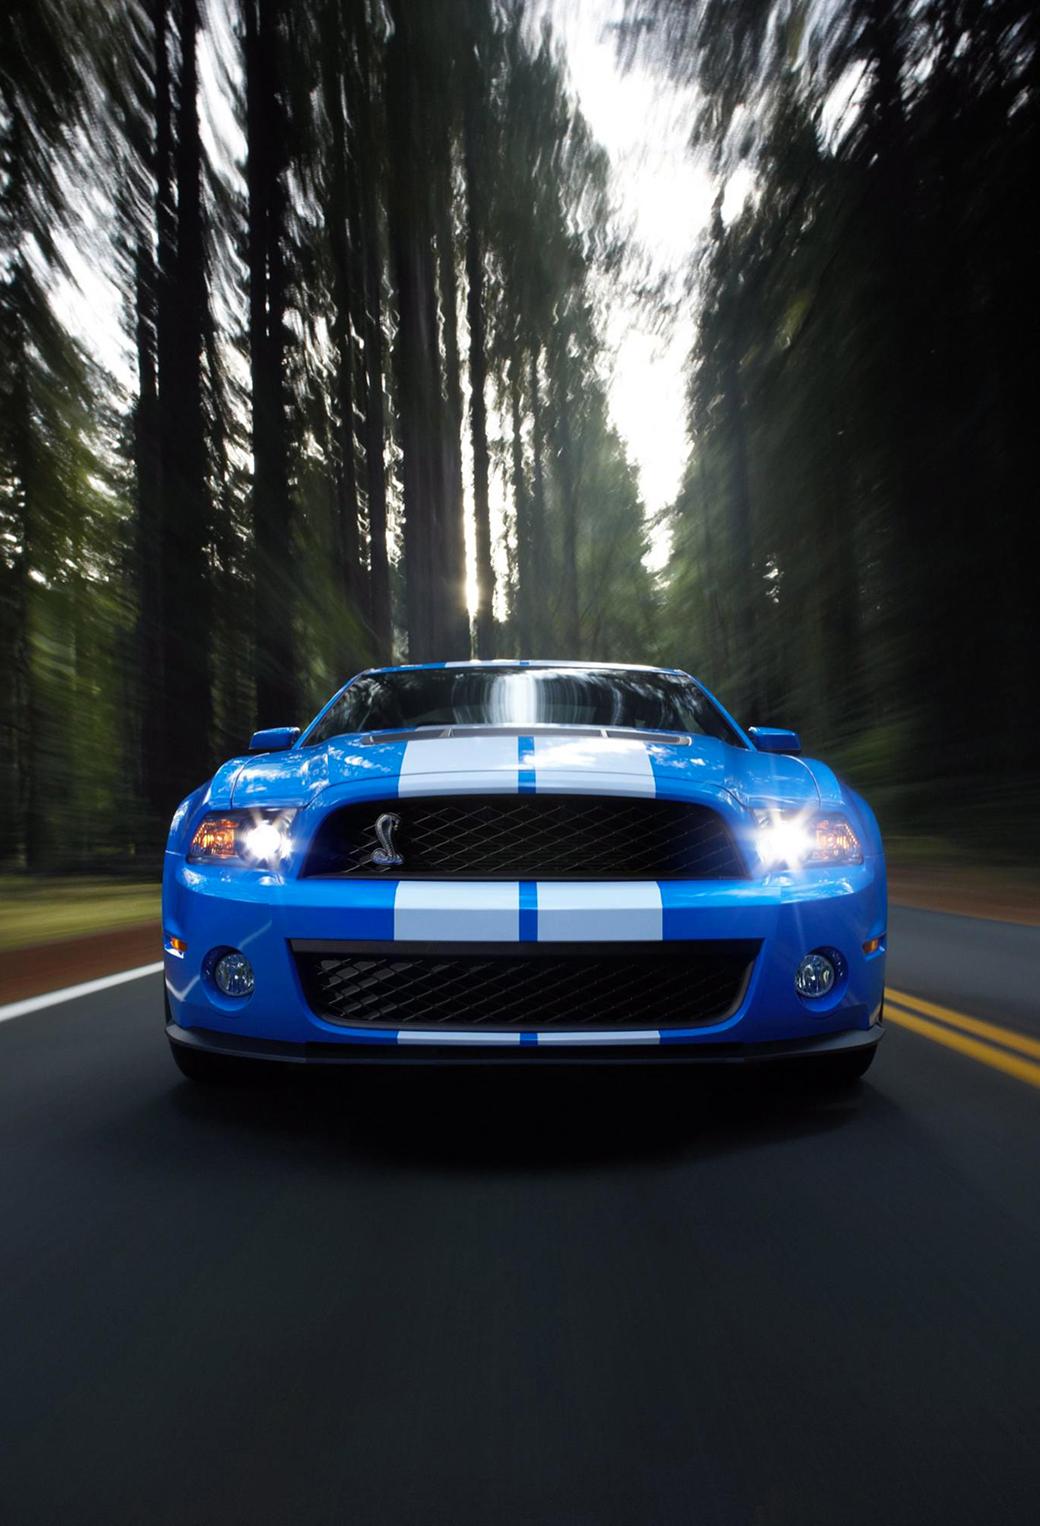 Mustang 3Wallpapers iPhone Parallax Mustang